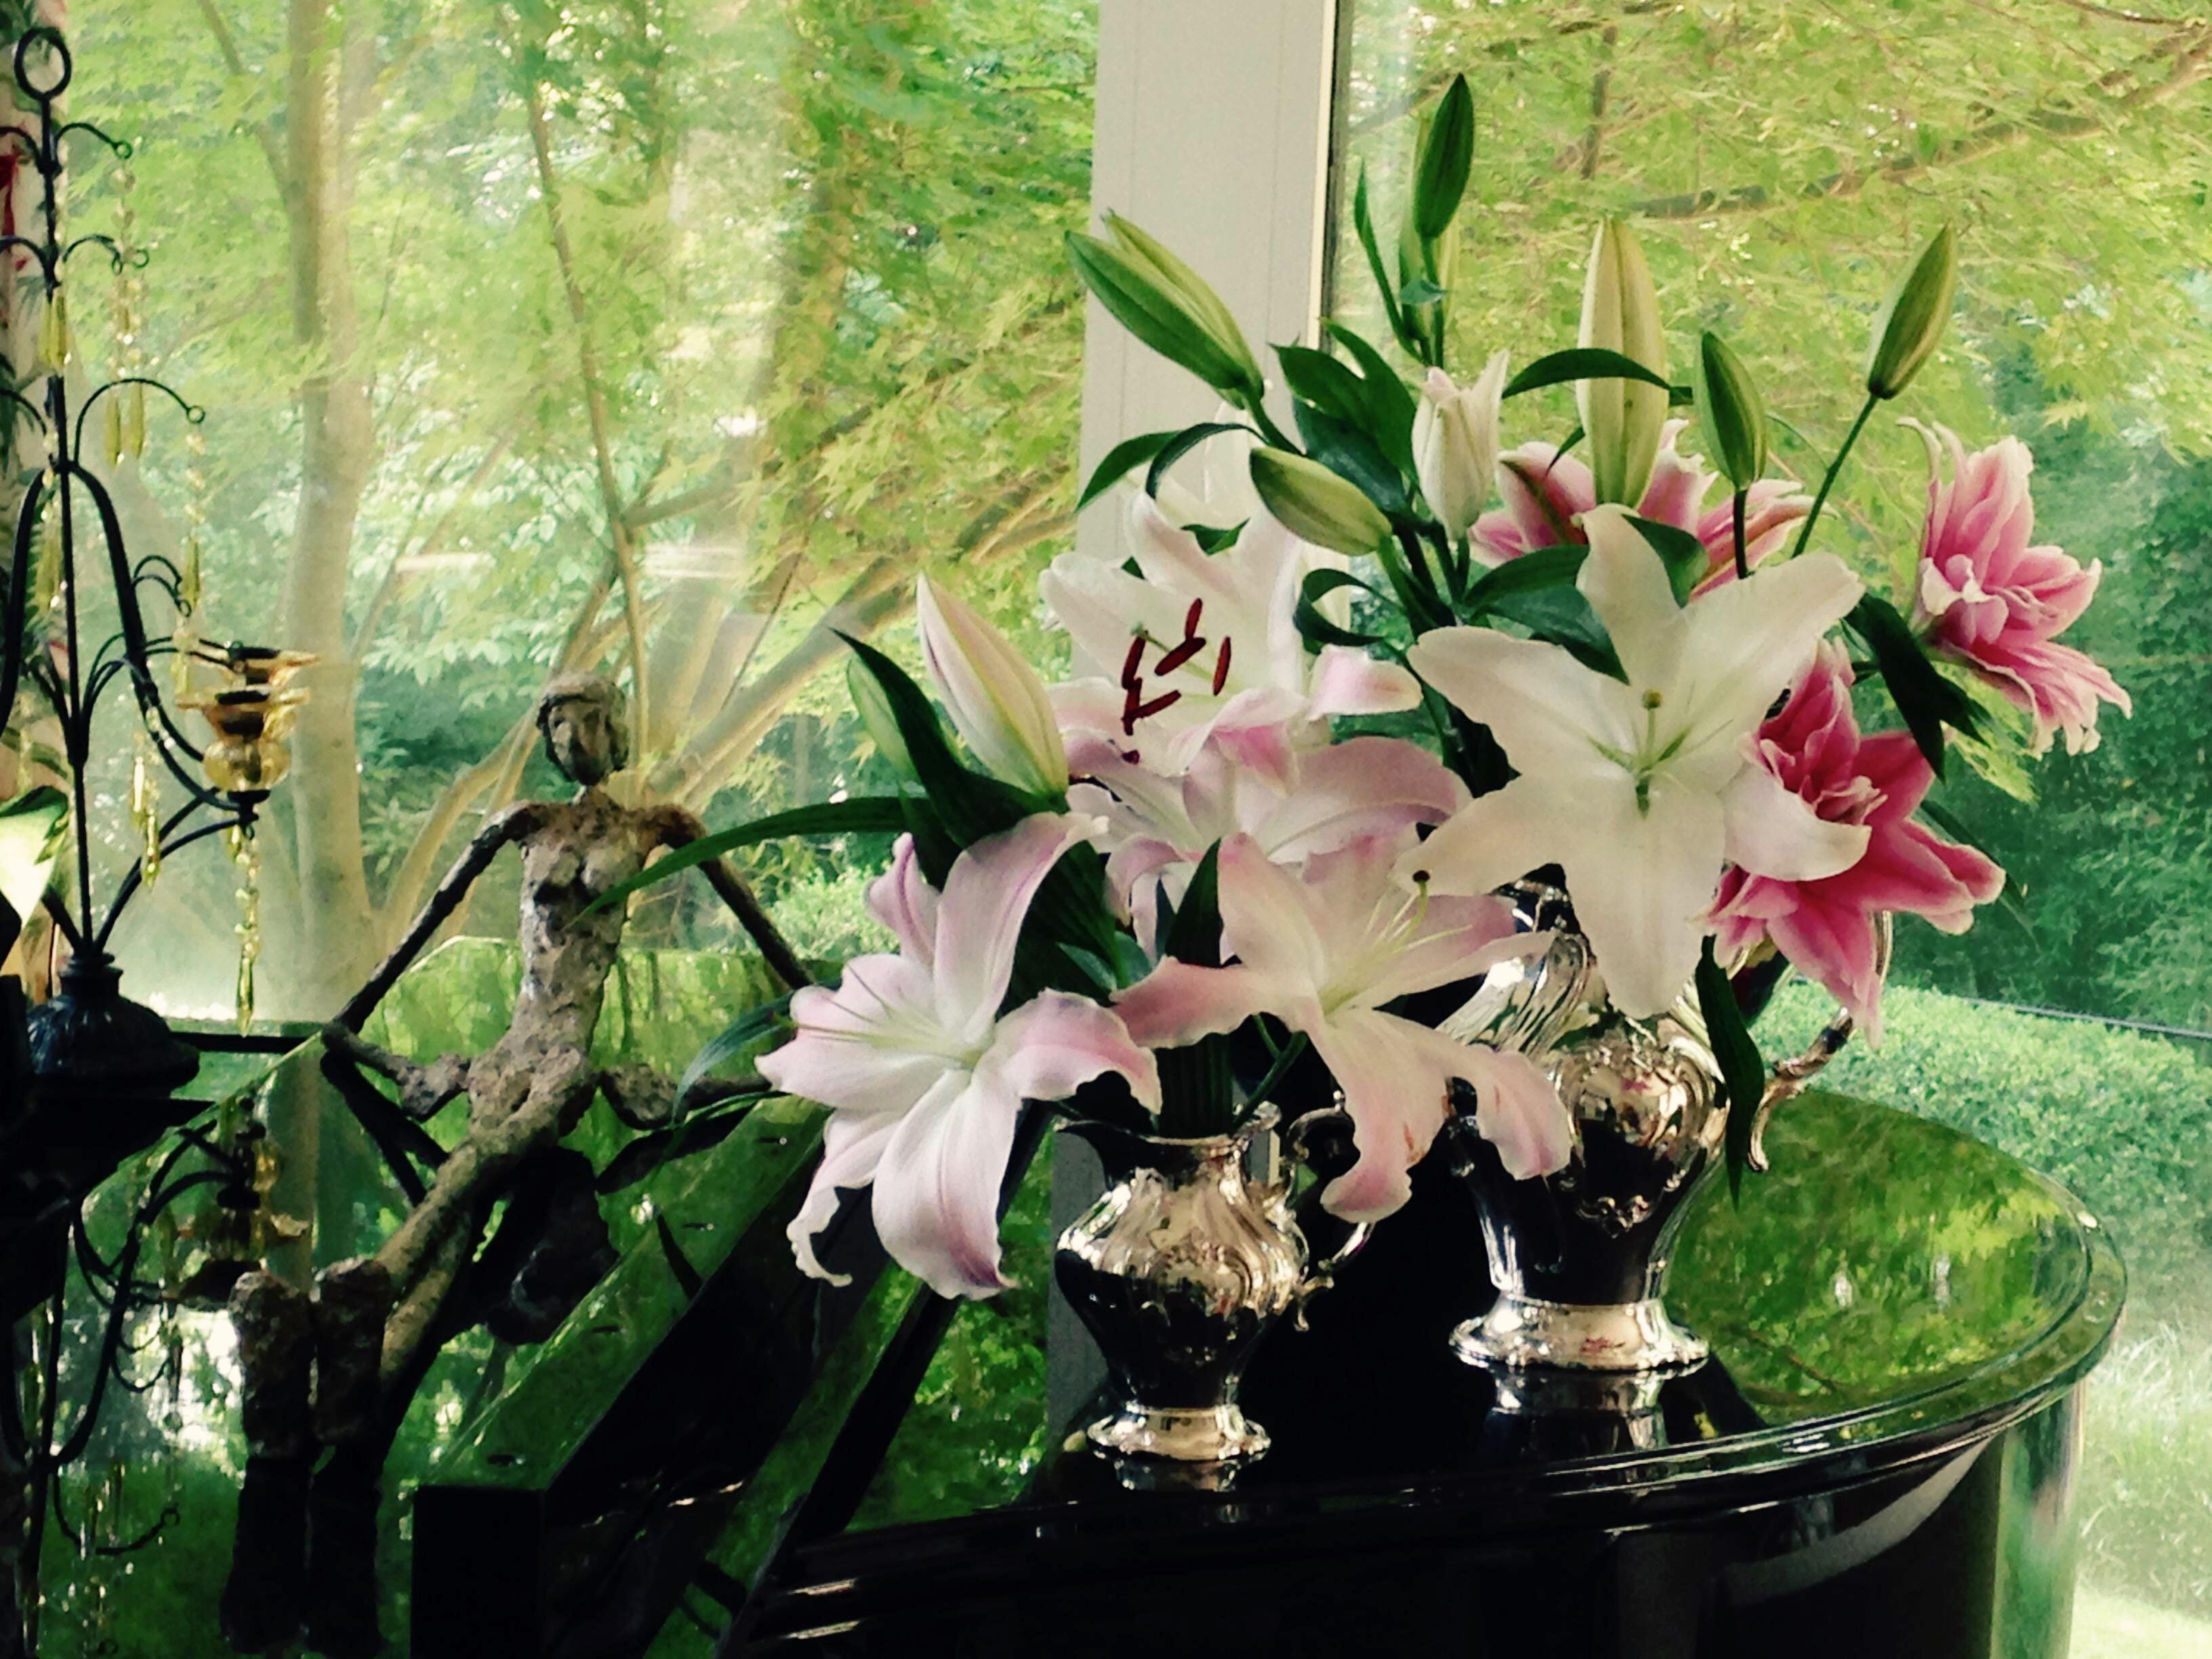 lilies-in-silver-service-ii